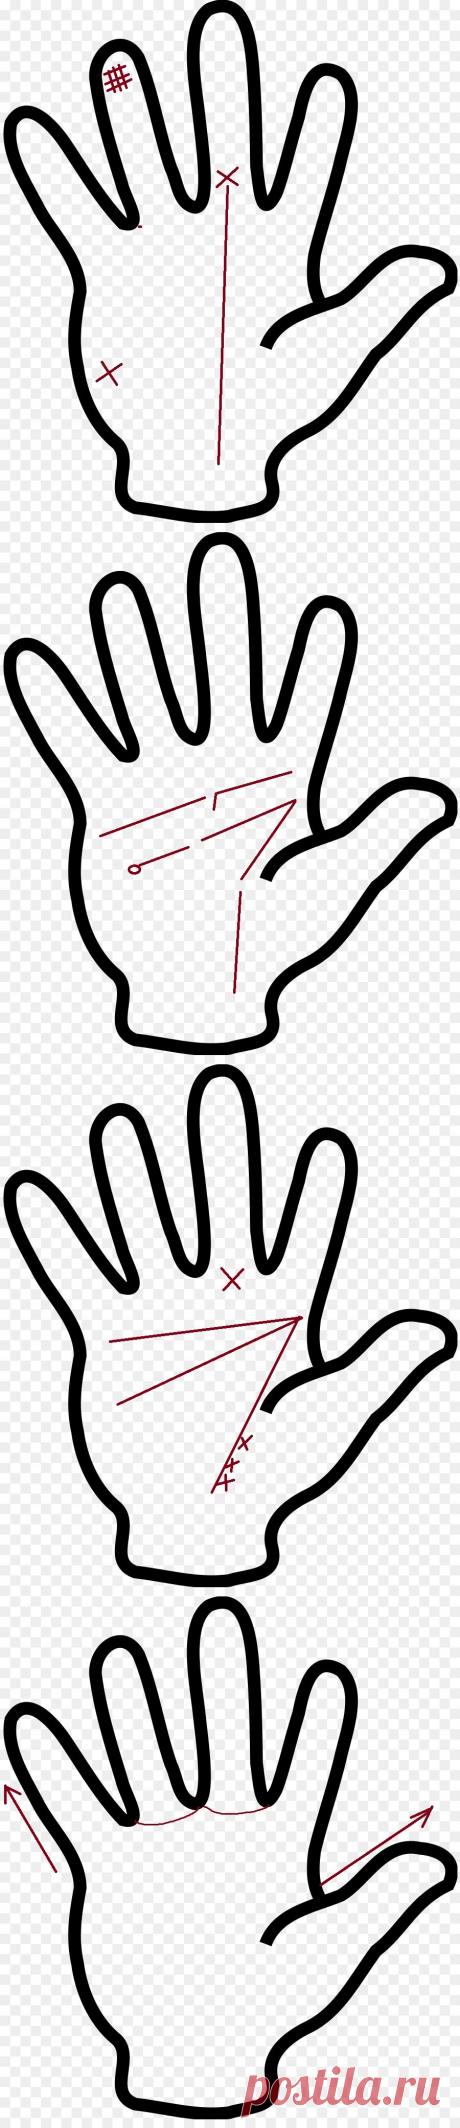 Недобрые знаки на руке   Леля Сережкина   Яндекс Дзен